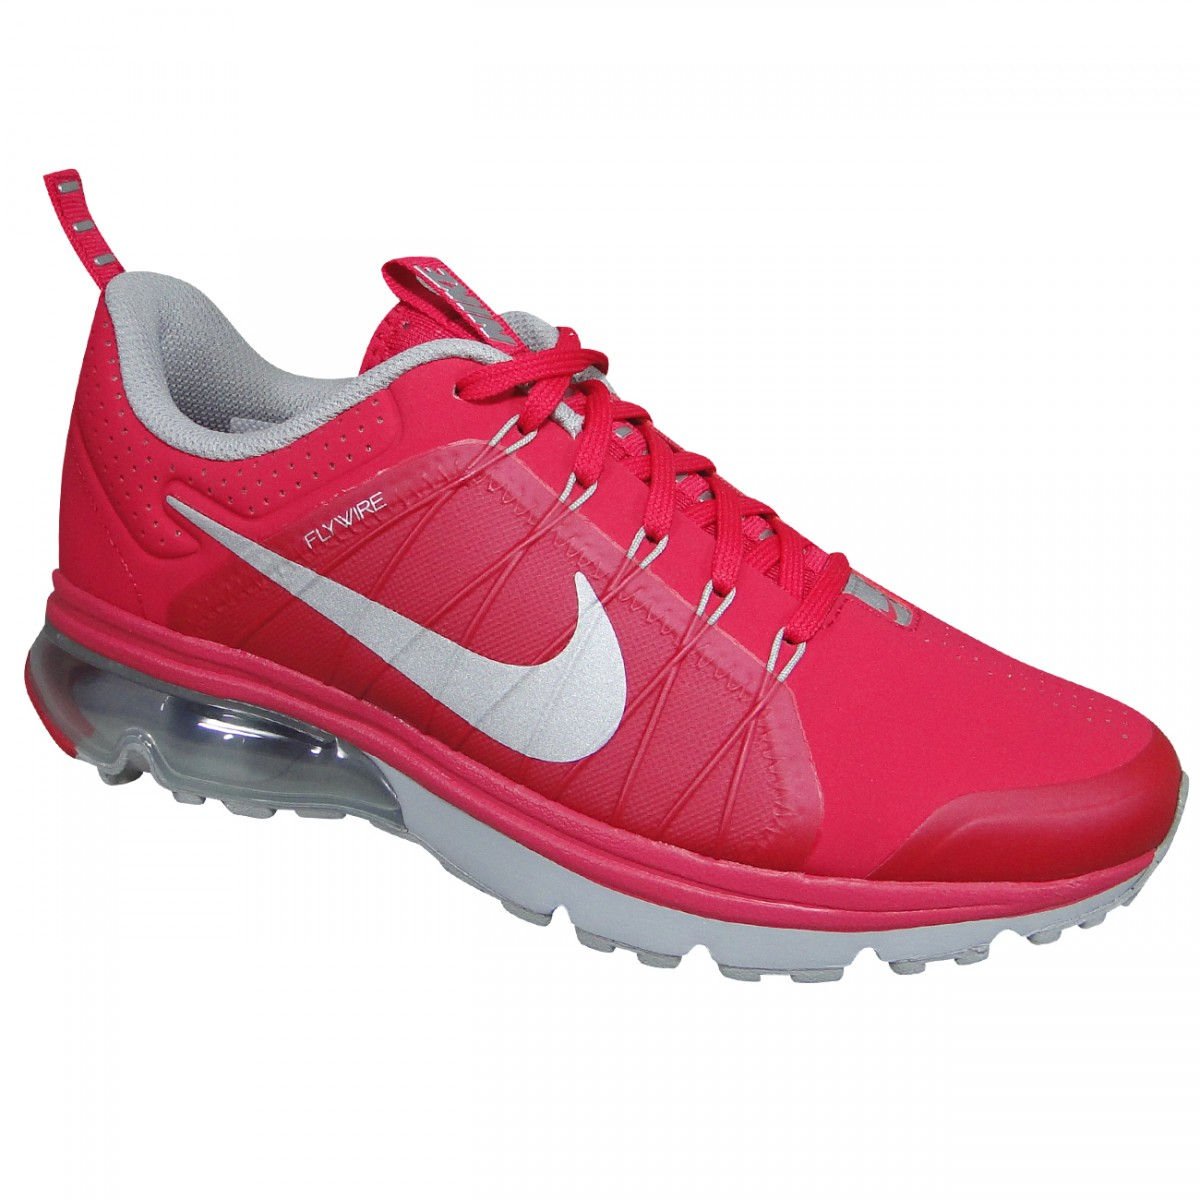 cad1a9da7e Tenis Nike Air Max Supreme 4 806868 601 - Rosa Cereja Cinza - Chuteira Nike